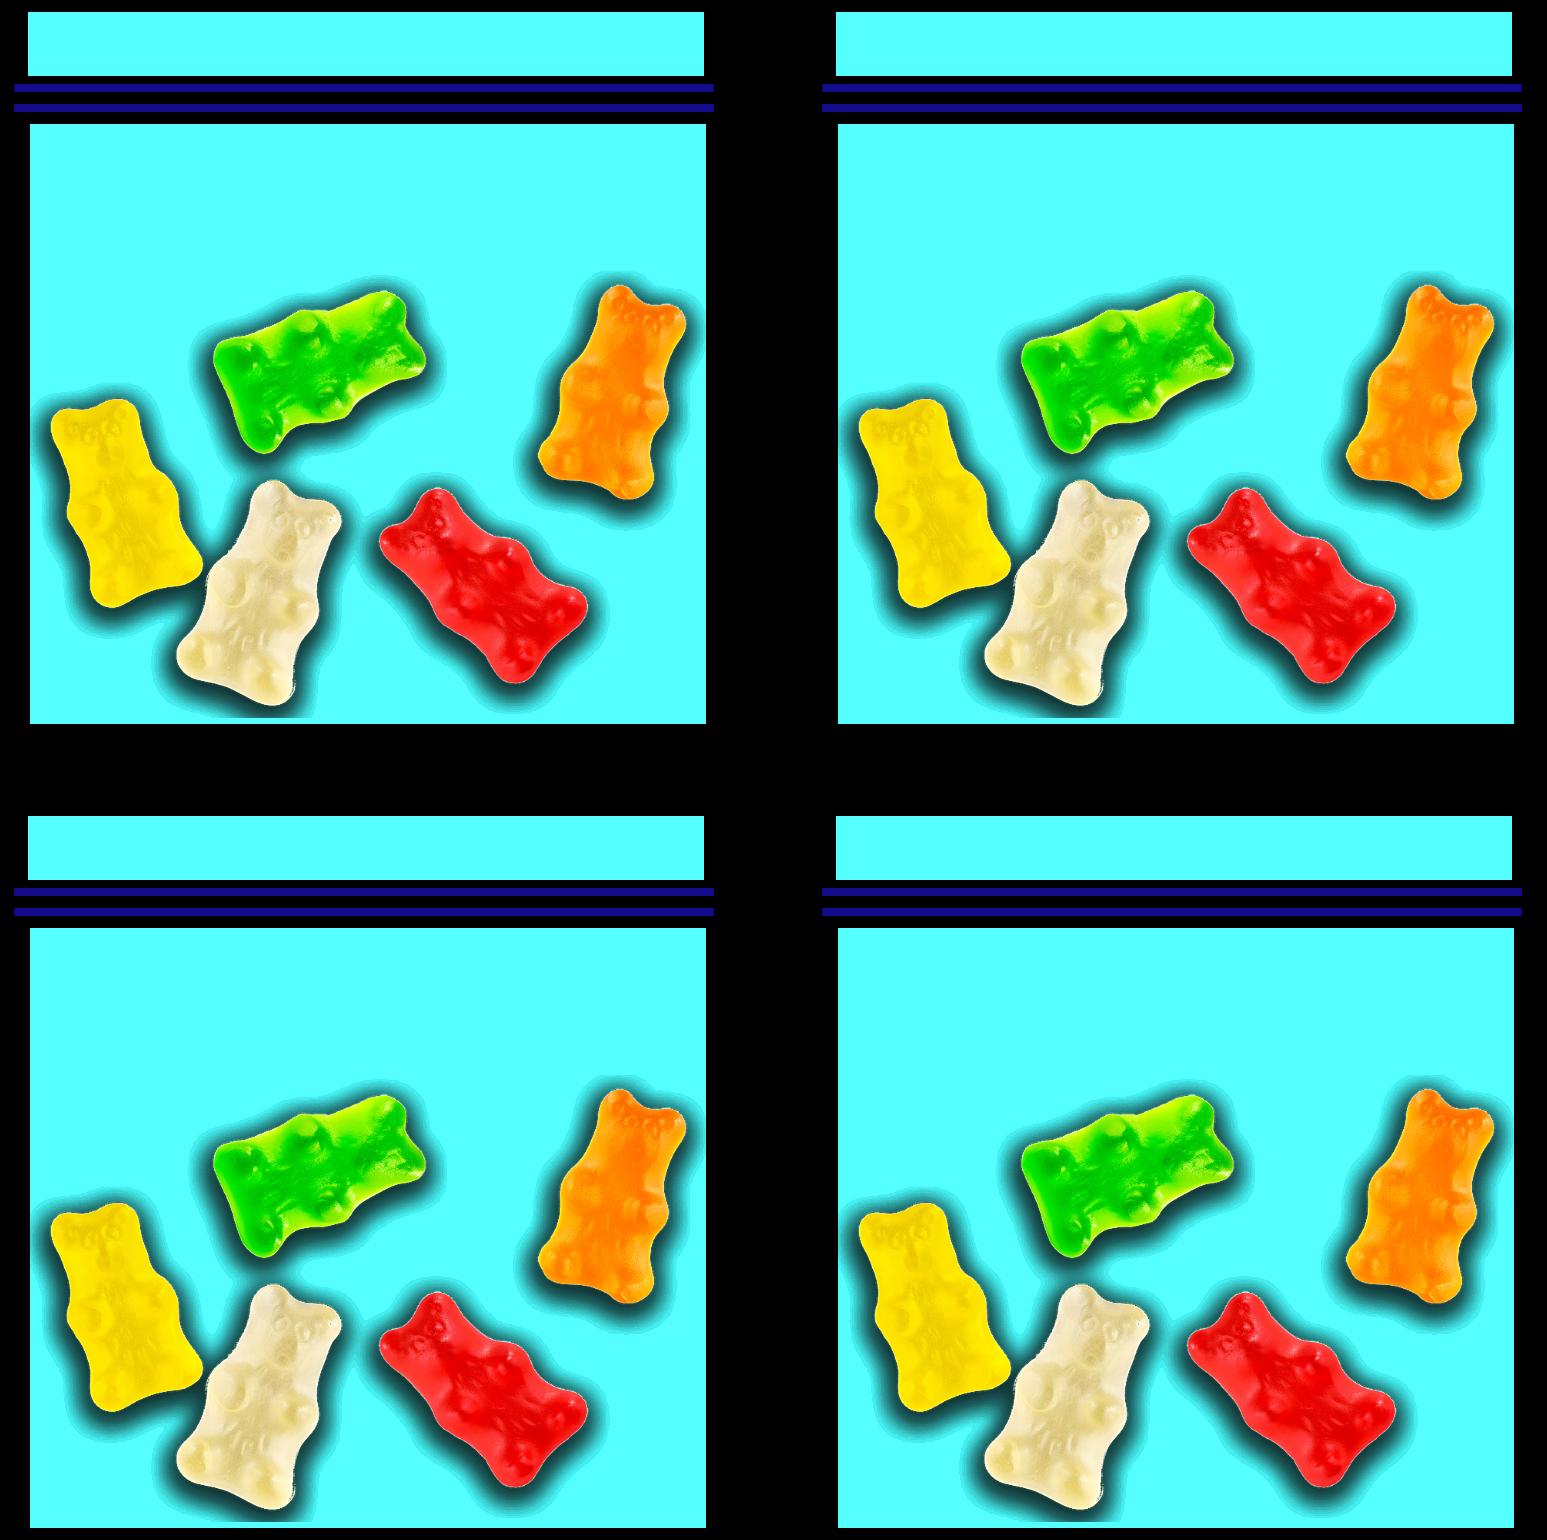 4 group of 5 gummy bears